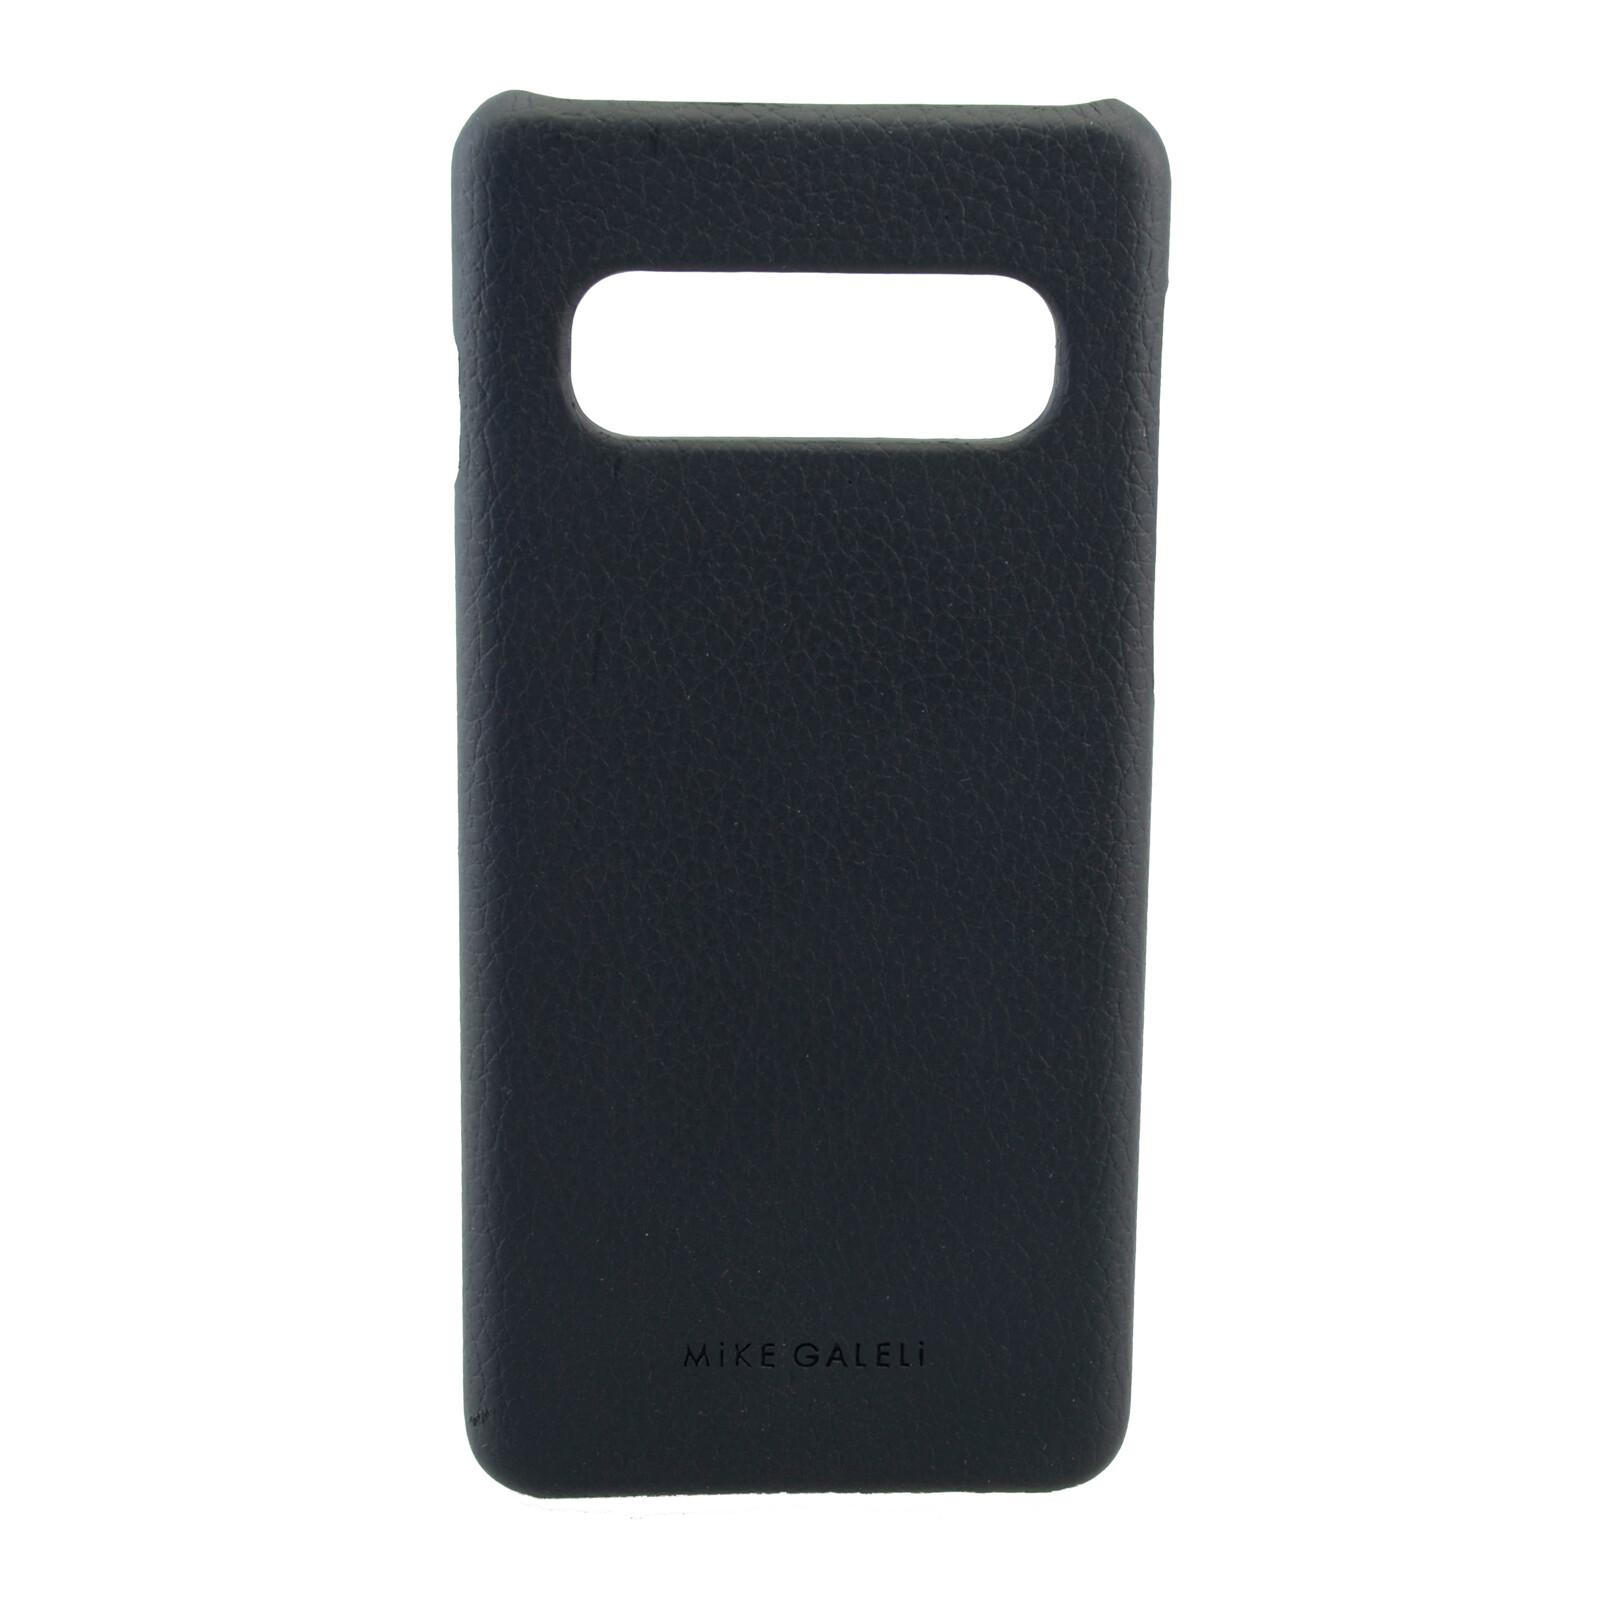 Galeli Back Cover Lenny Samsung Galaxy S10